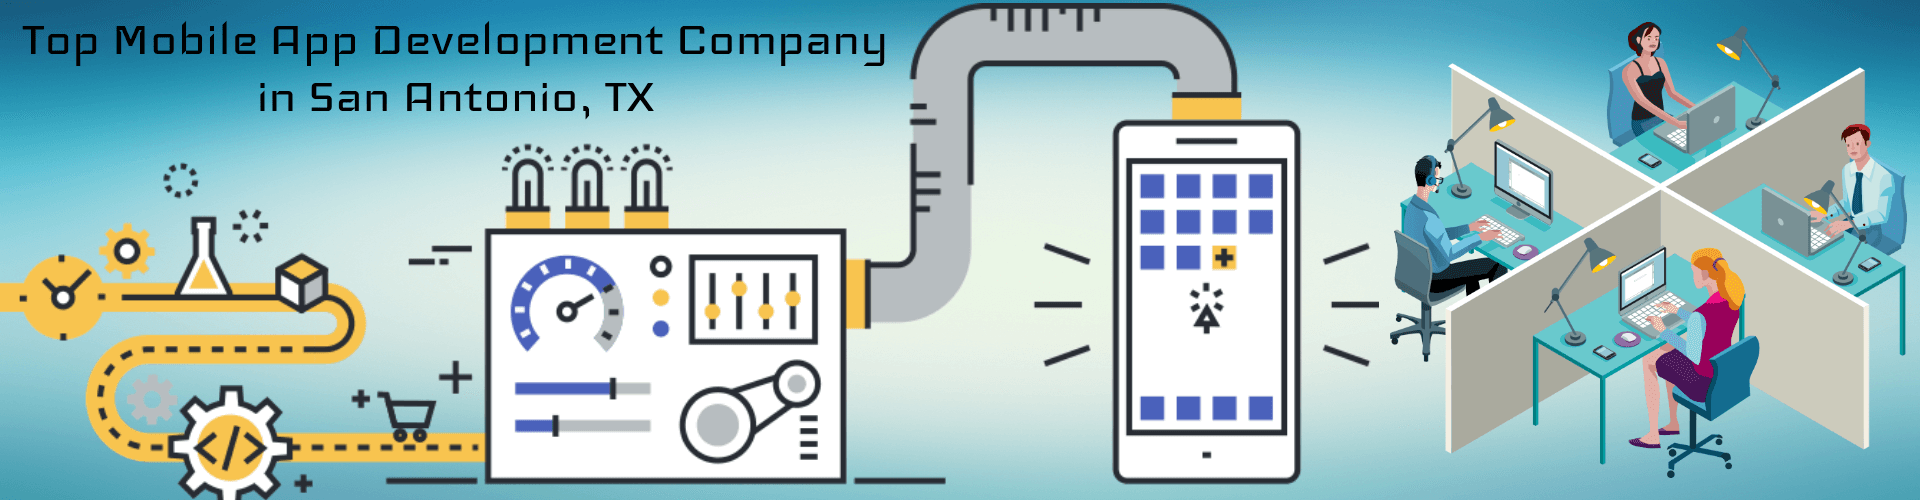 mobile app development company san antonio